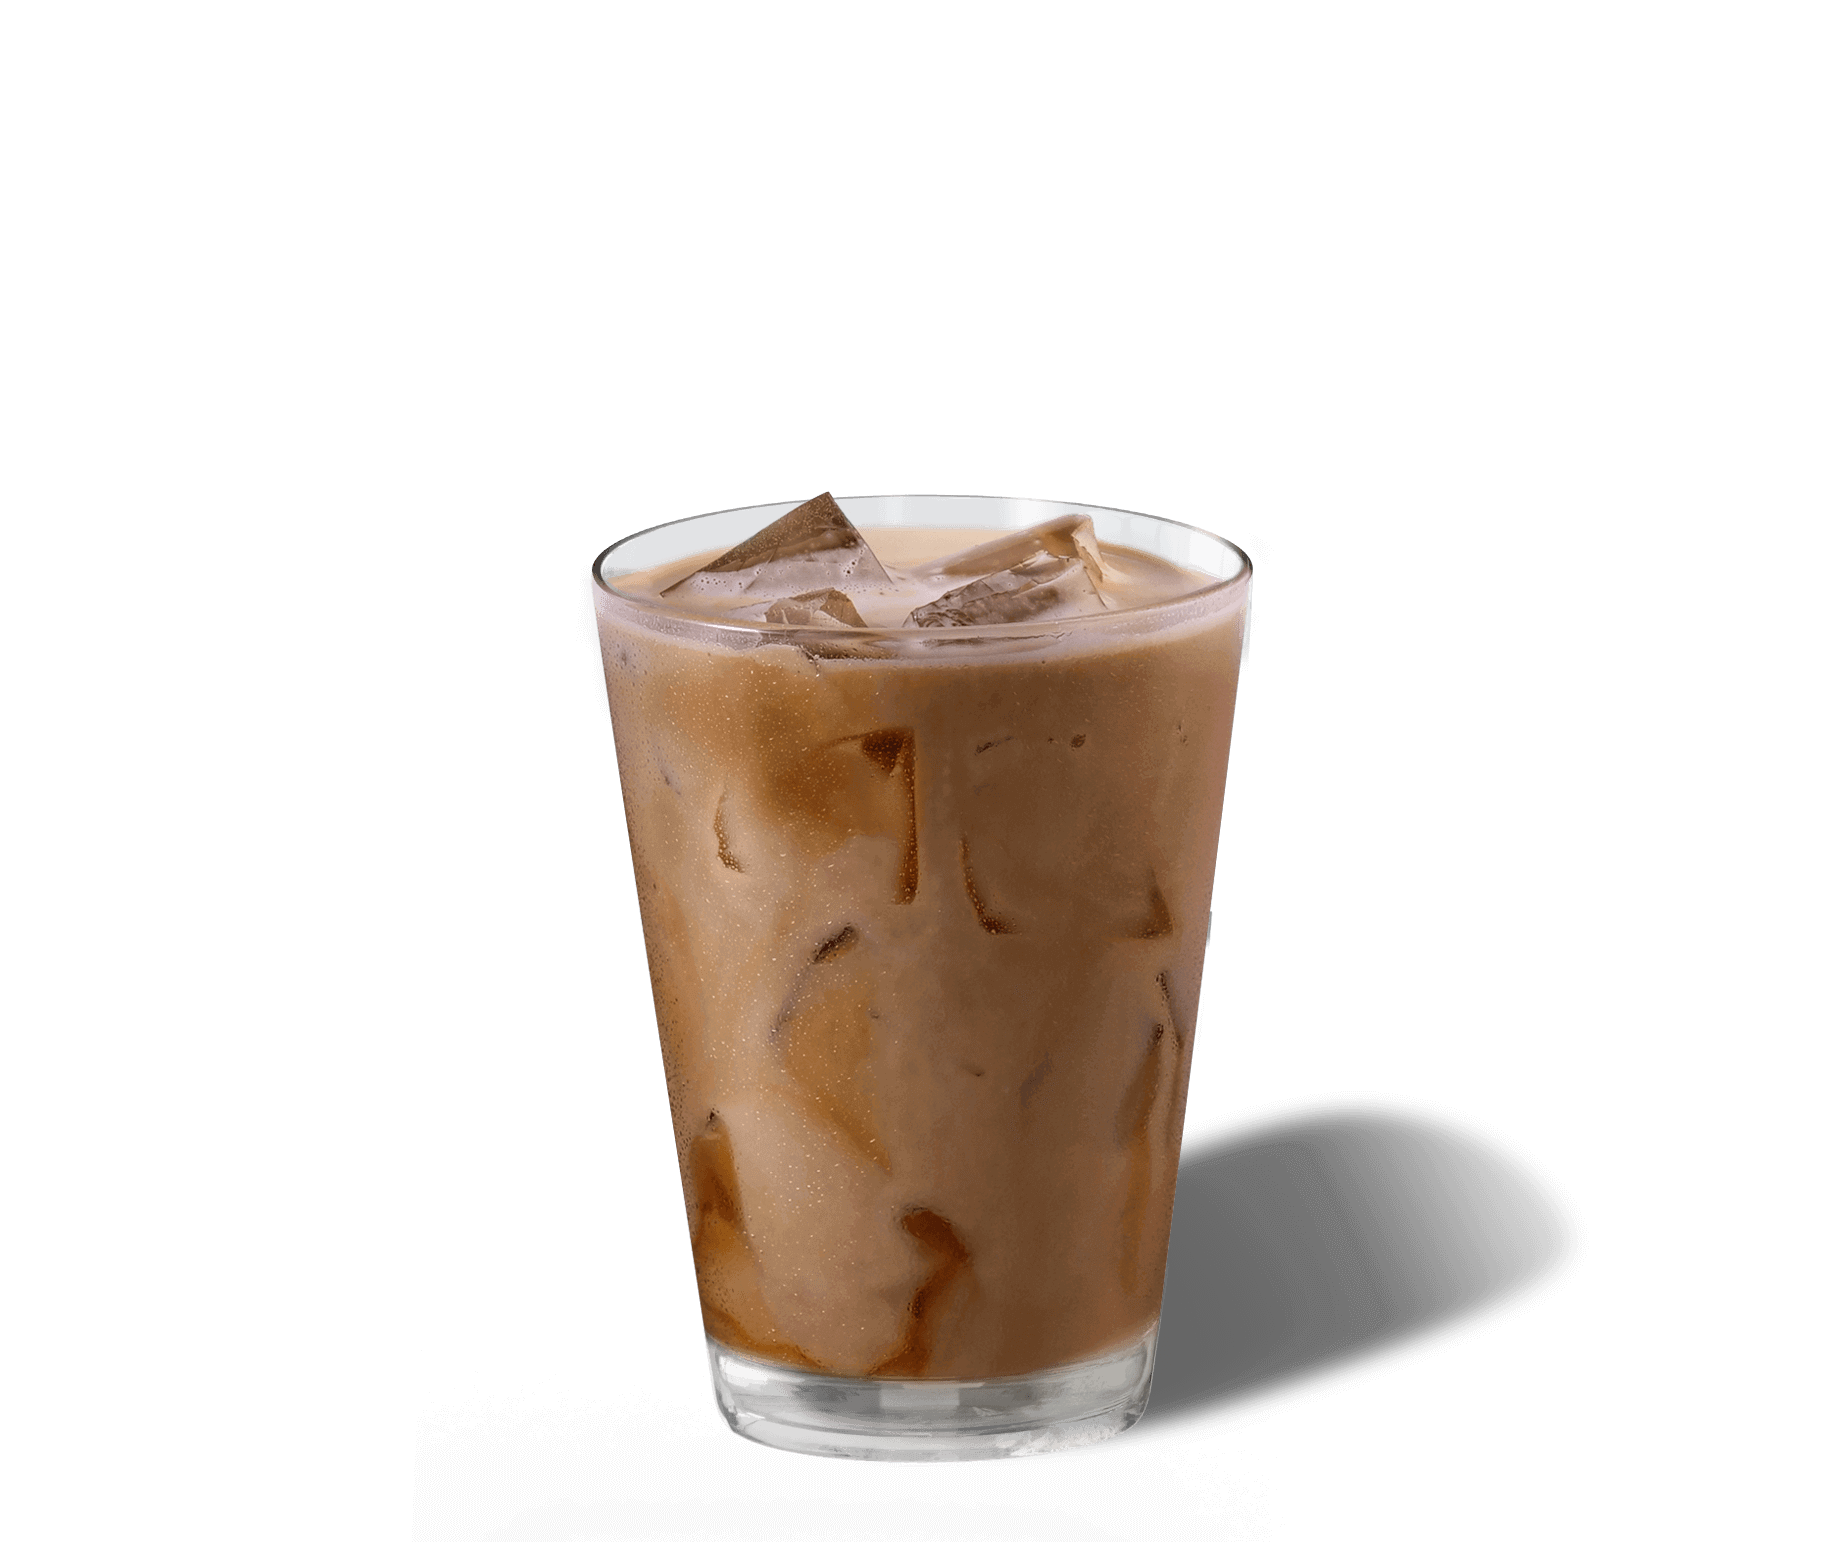 2-IcedLatte_LongShadow_Cream